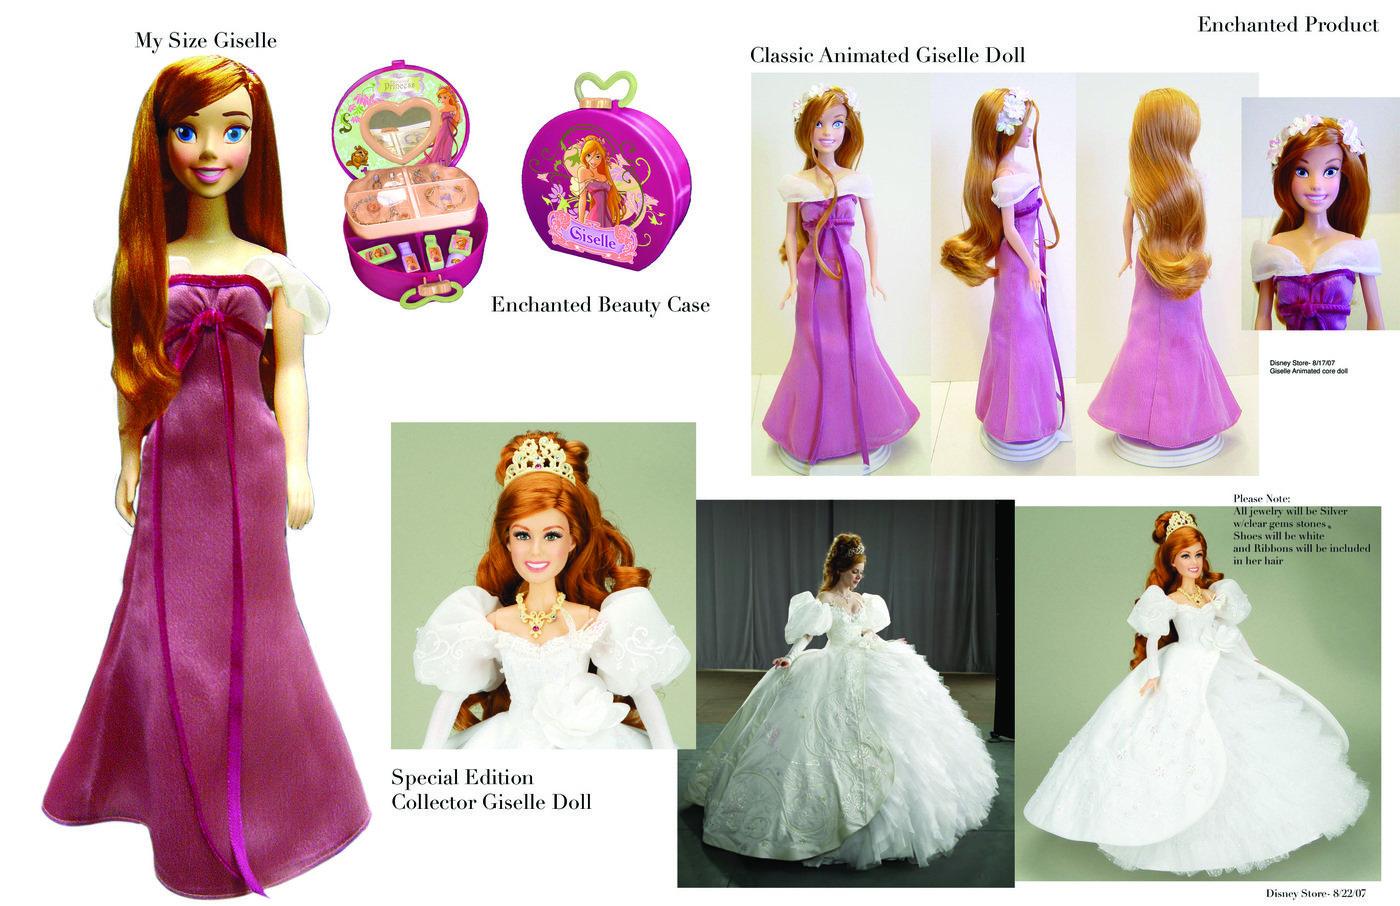 Fashion Dolls By Glitter Beast Design Jaime Tracht At